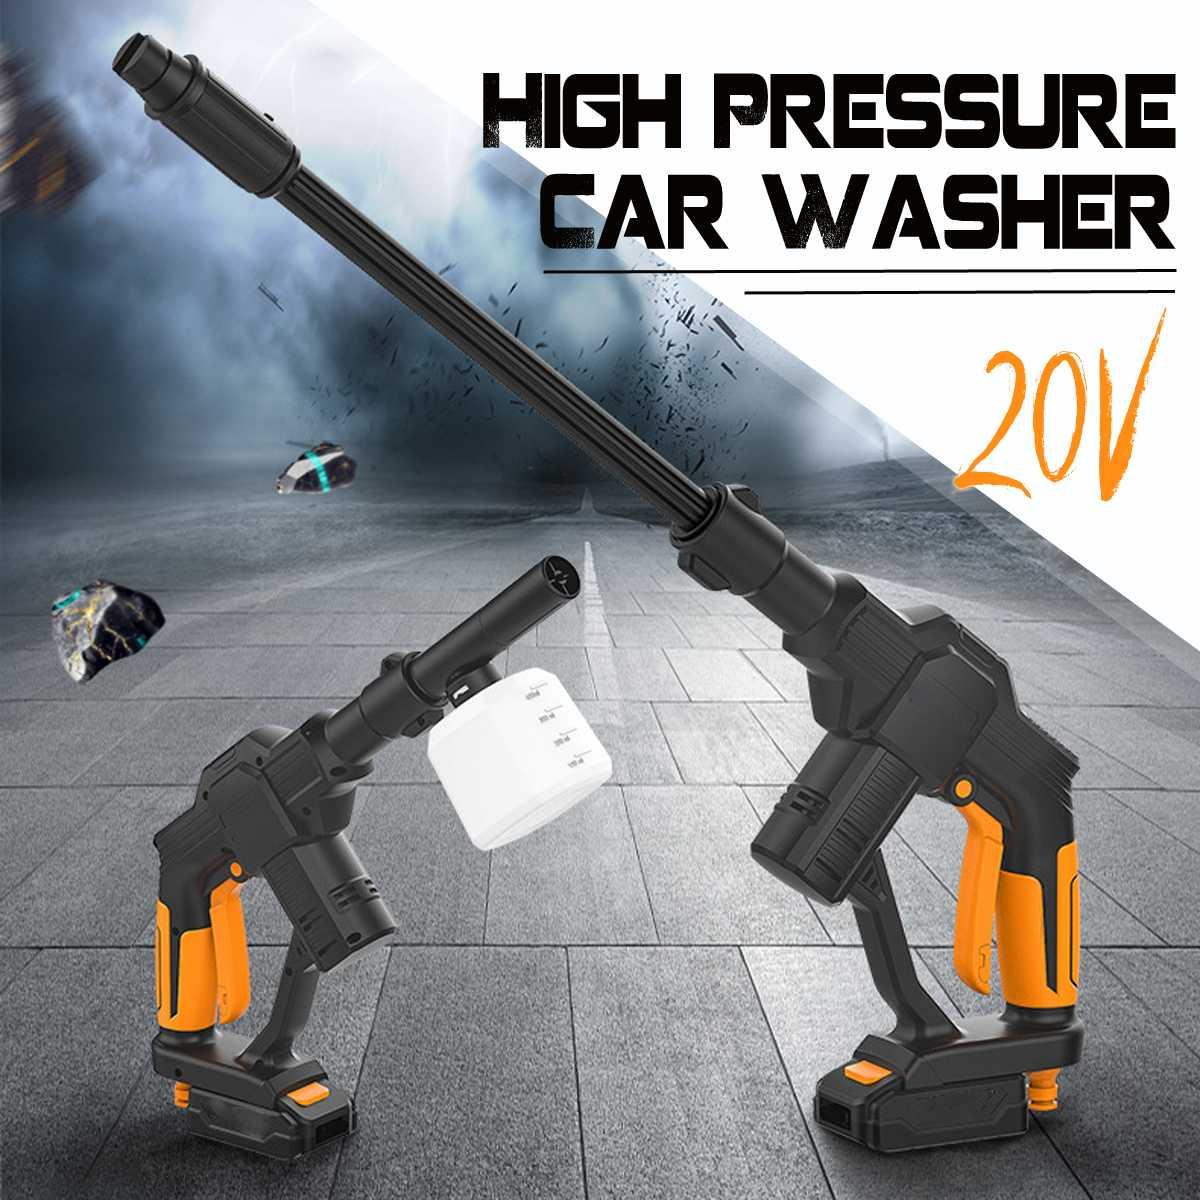 Wireless High Pressure Car Washer Guns 20V Portable Cordless Pressure Cleaner Rechargable Car Care Washing Machine W/ 5m Tube